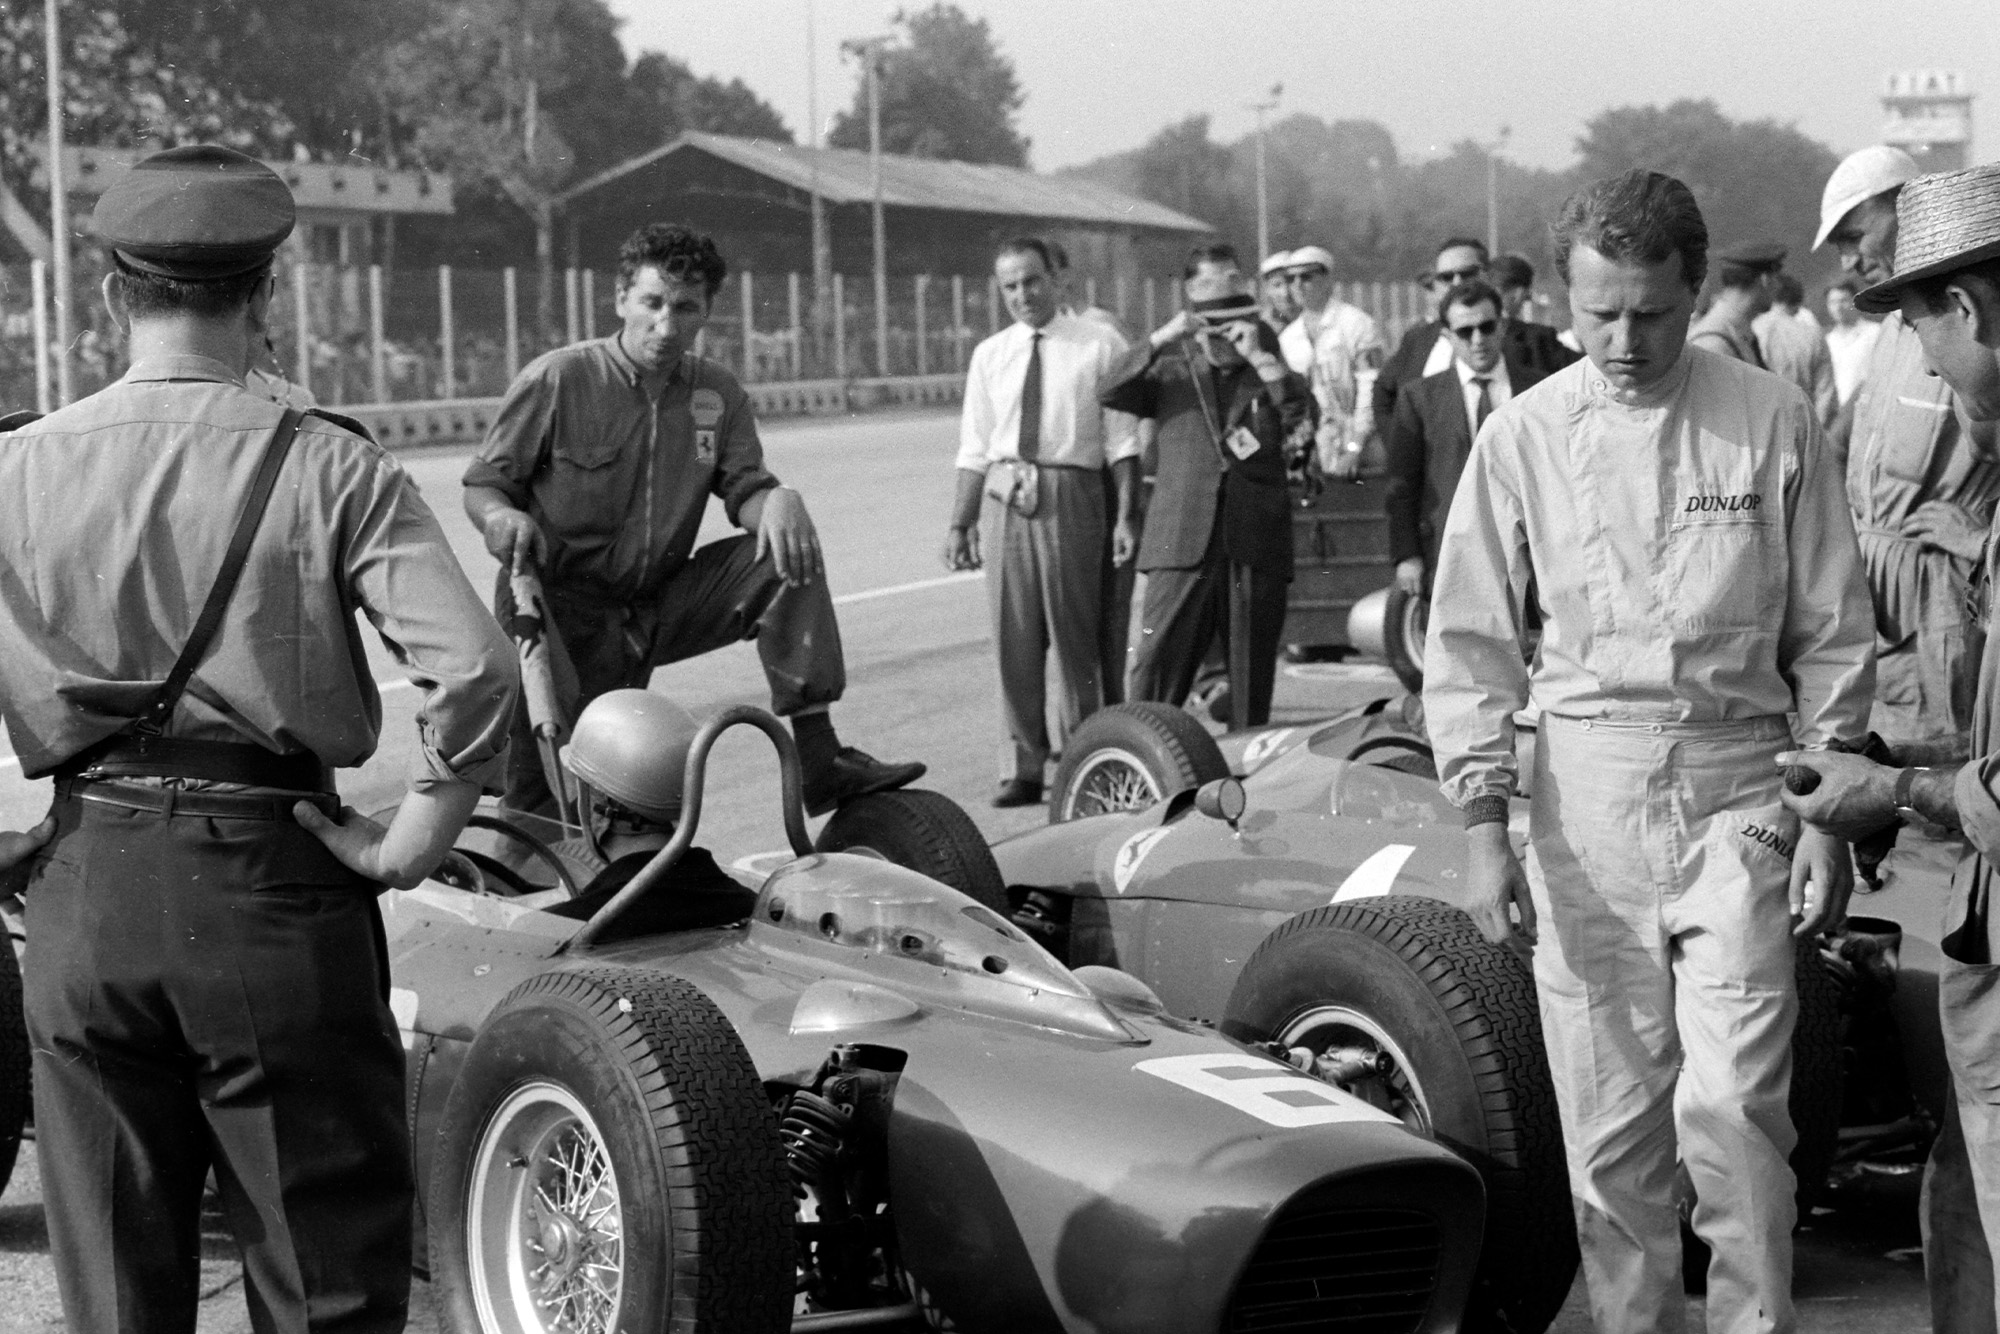 Bandini prepares to leave the Ferrari pit as team-mate Baghetti walks by